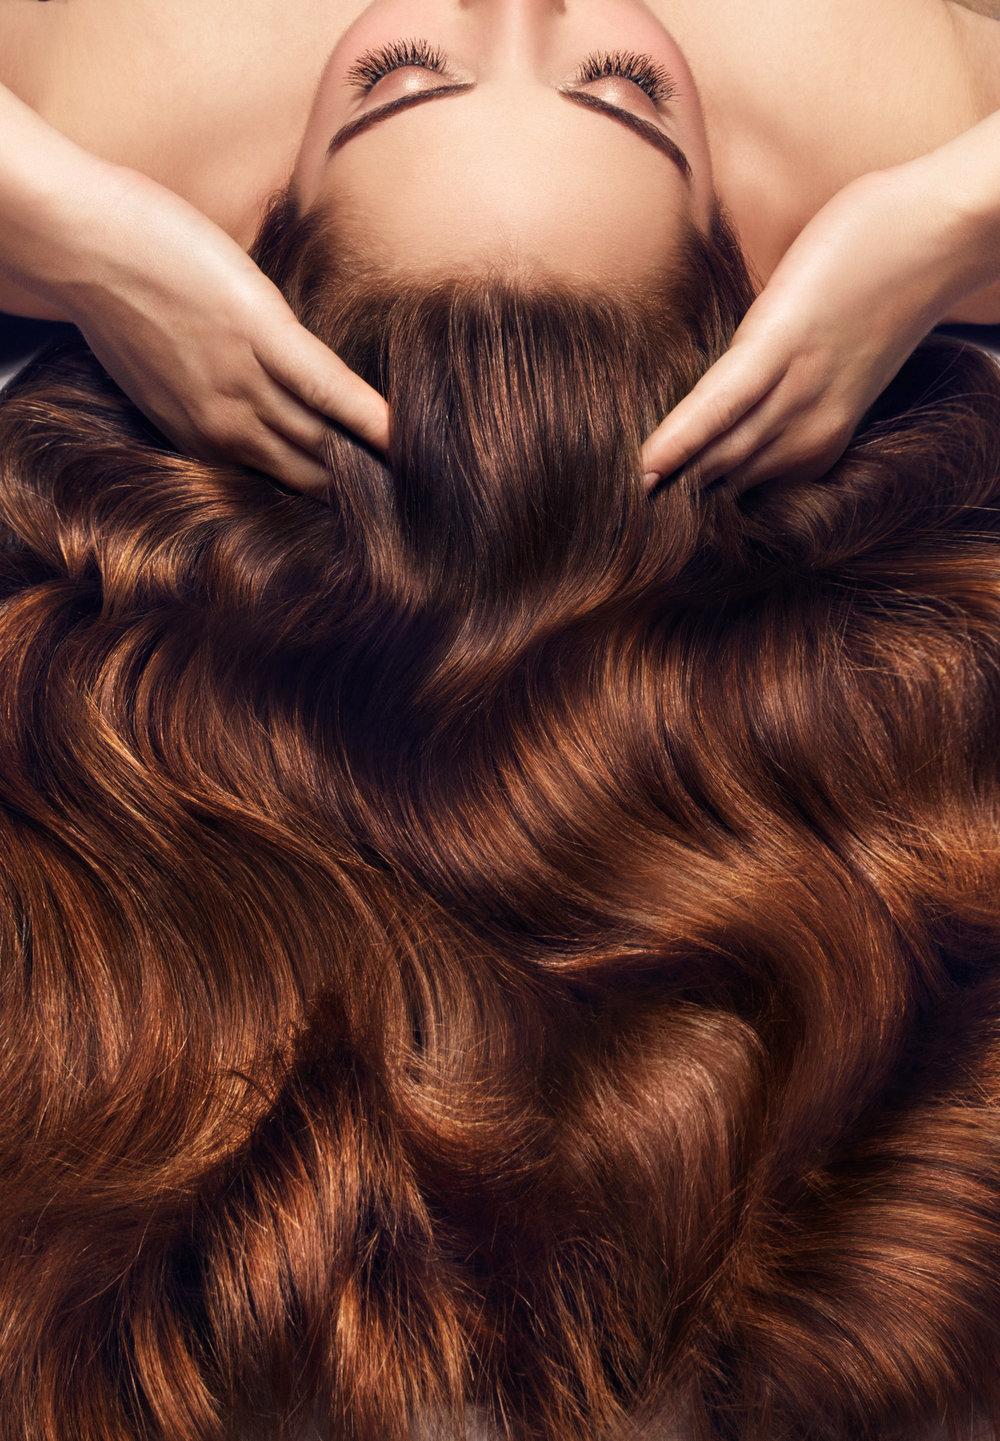 Jack_Eames_Curls_London_Hair_Beauty_Photography.jpg